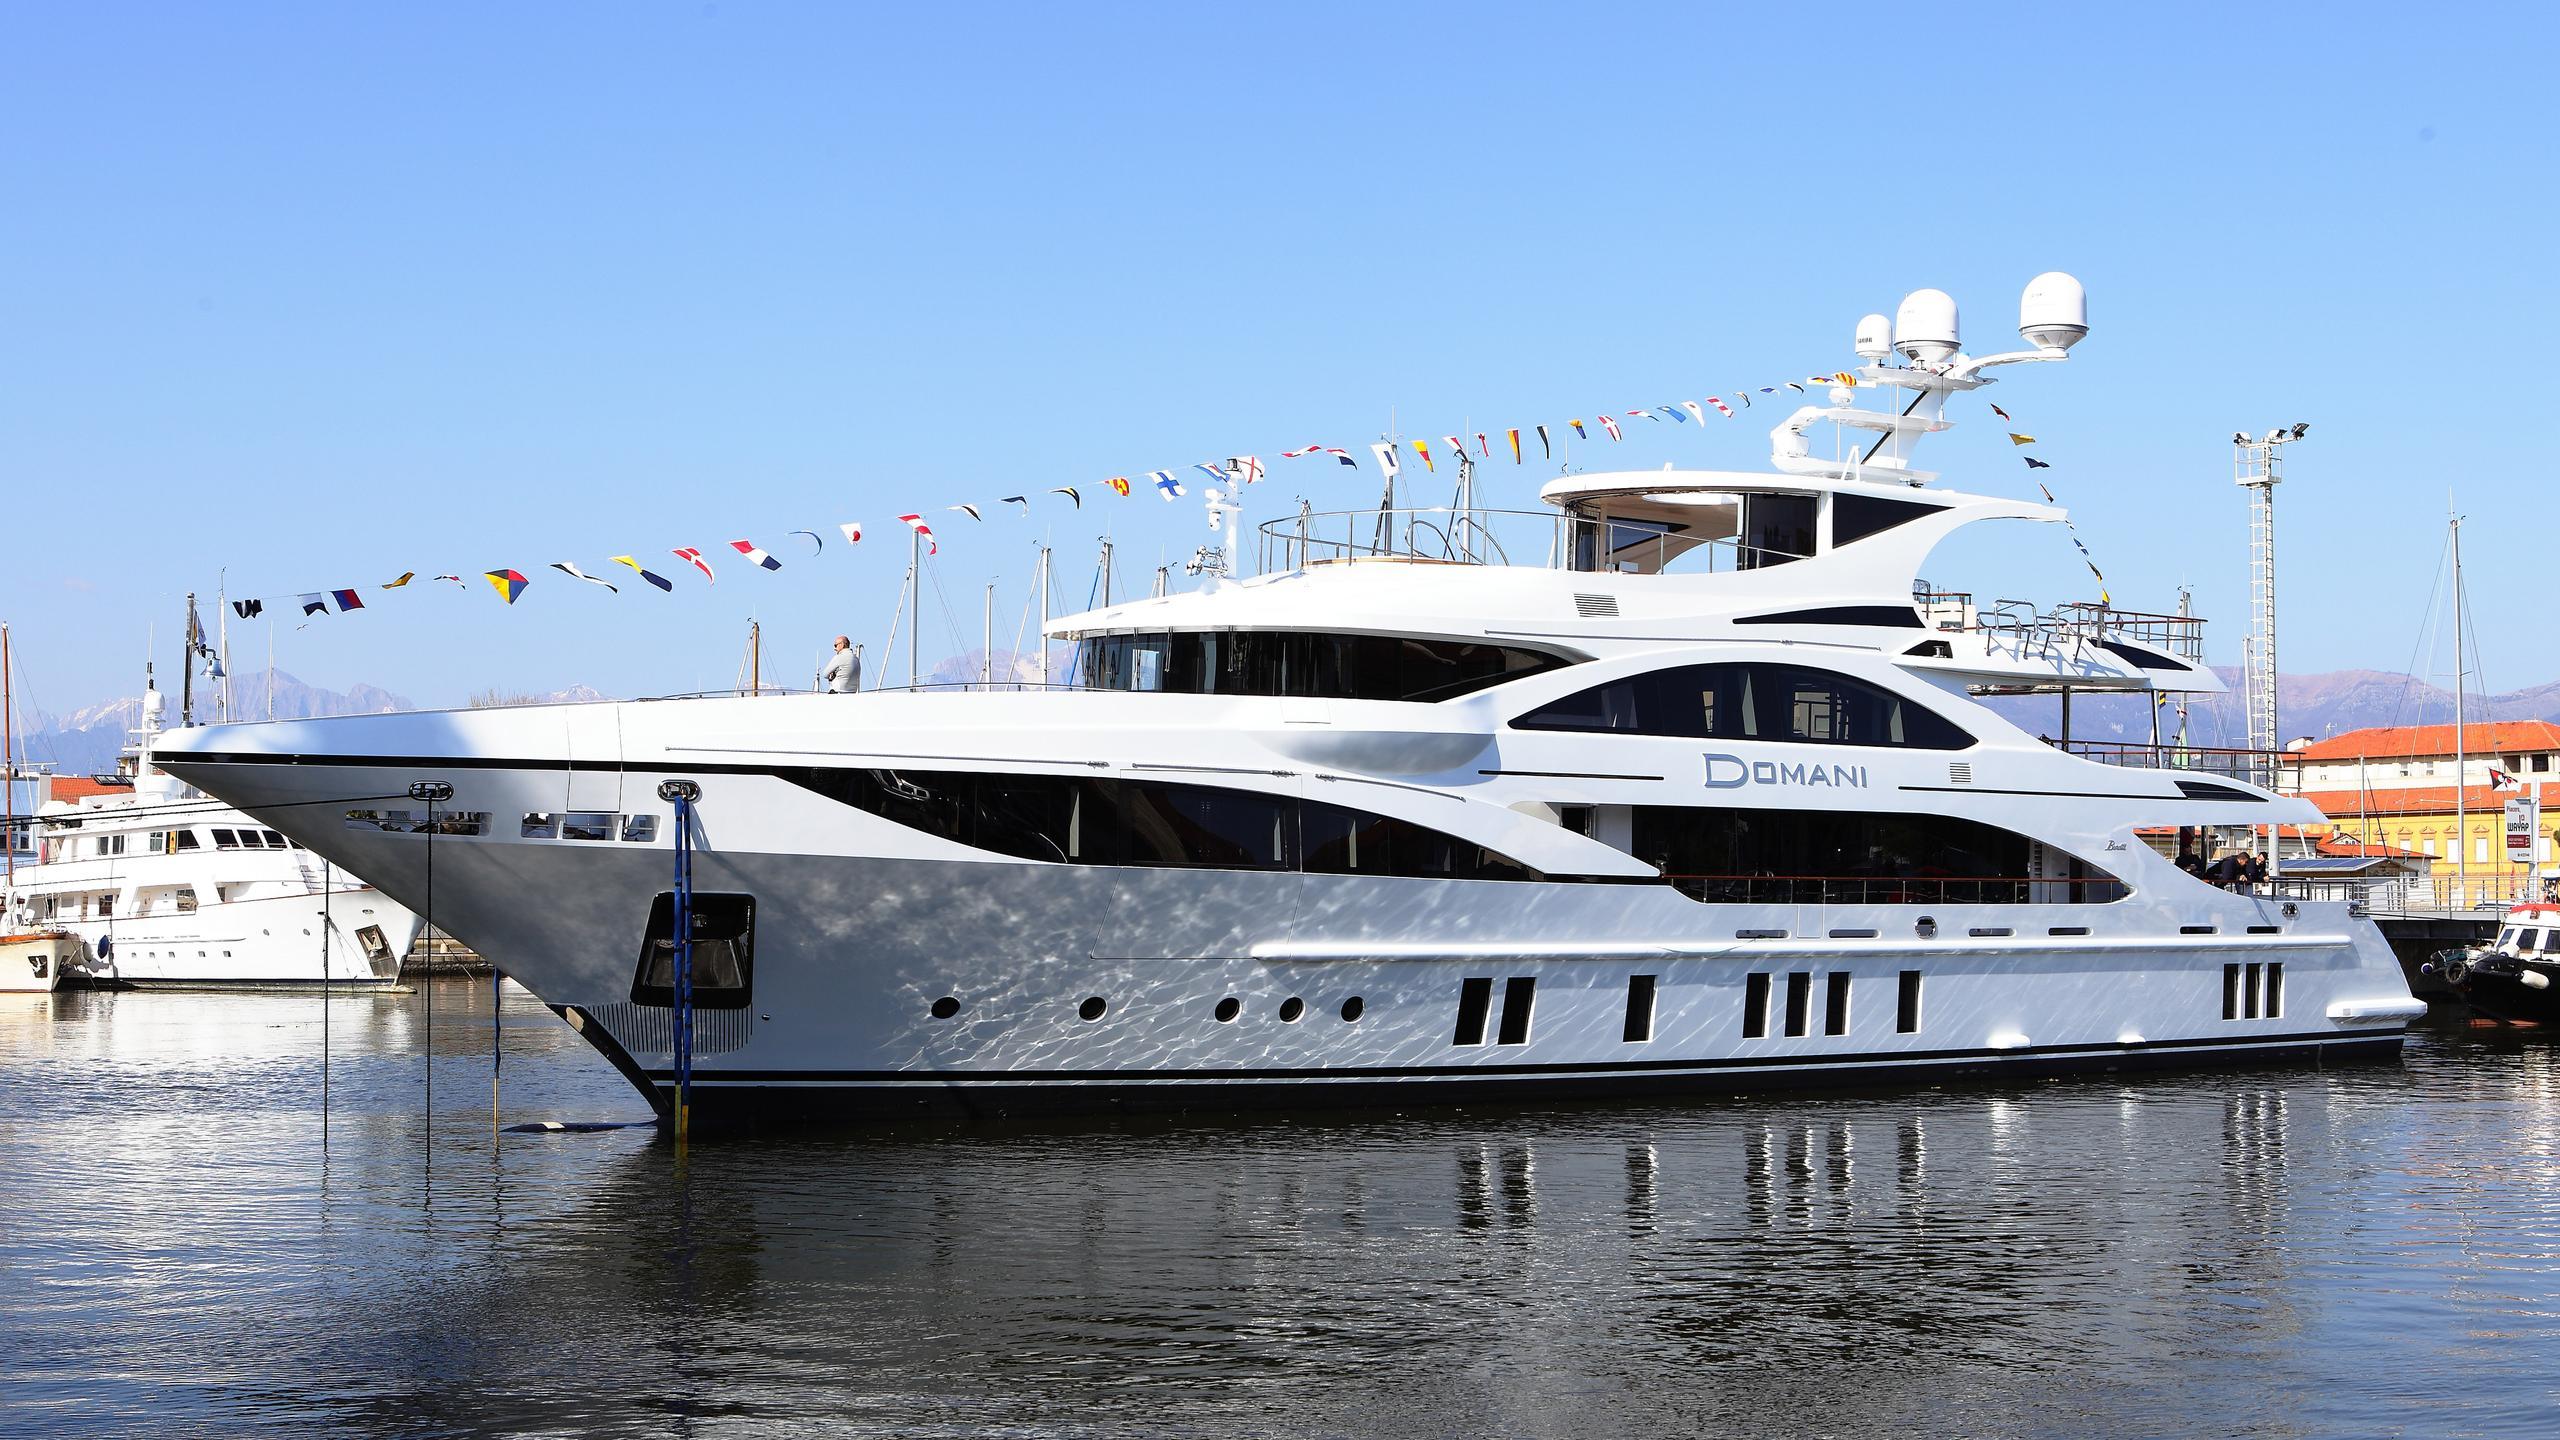 domani-motor-yacht-benetti-2016-42m-half-profile-launch